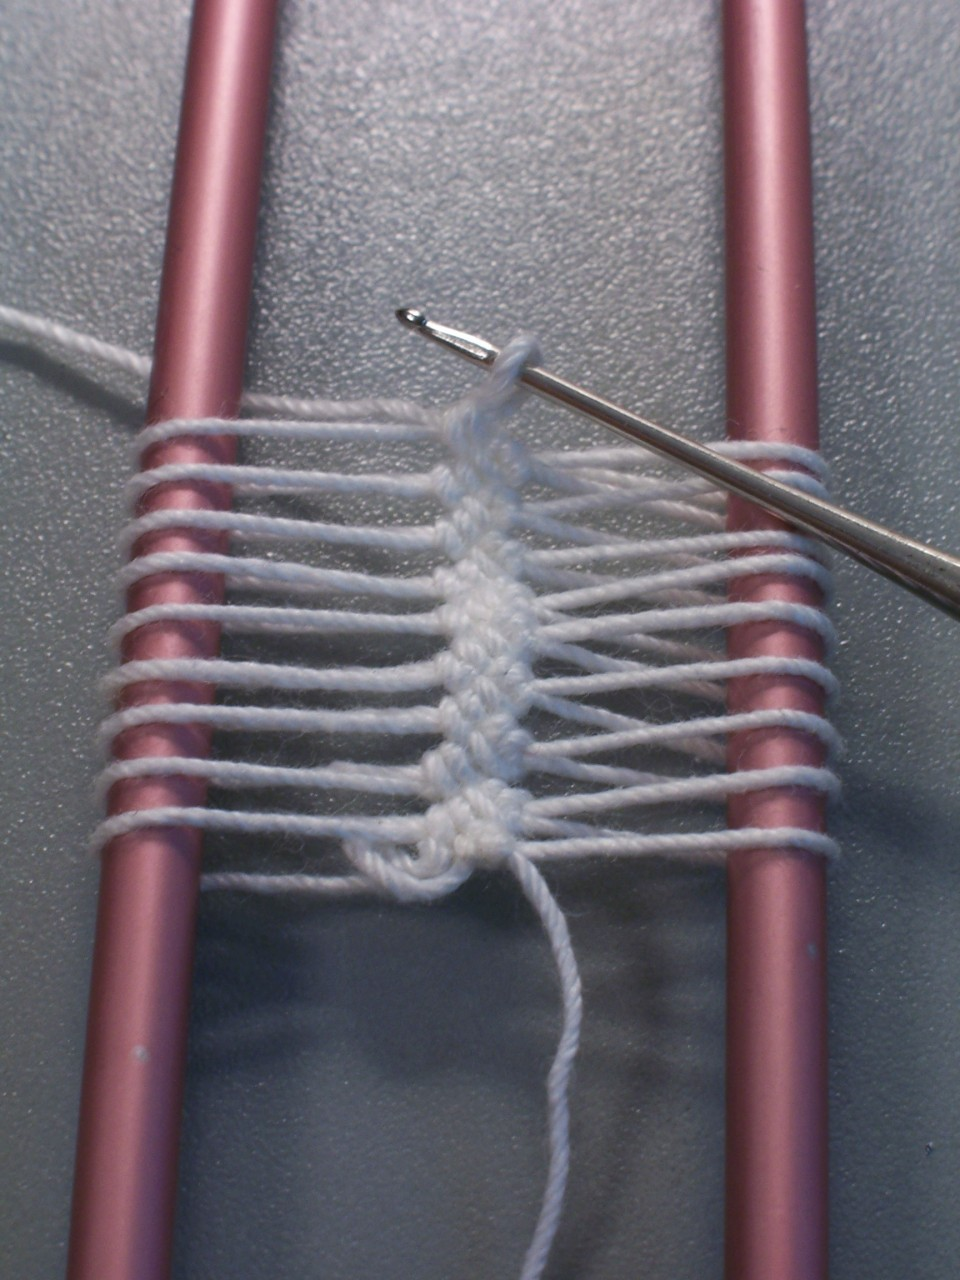 Вилка для вязания кружева